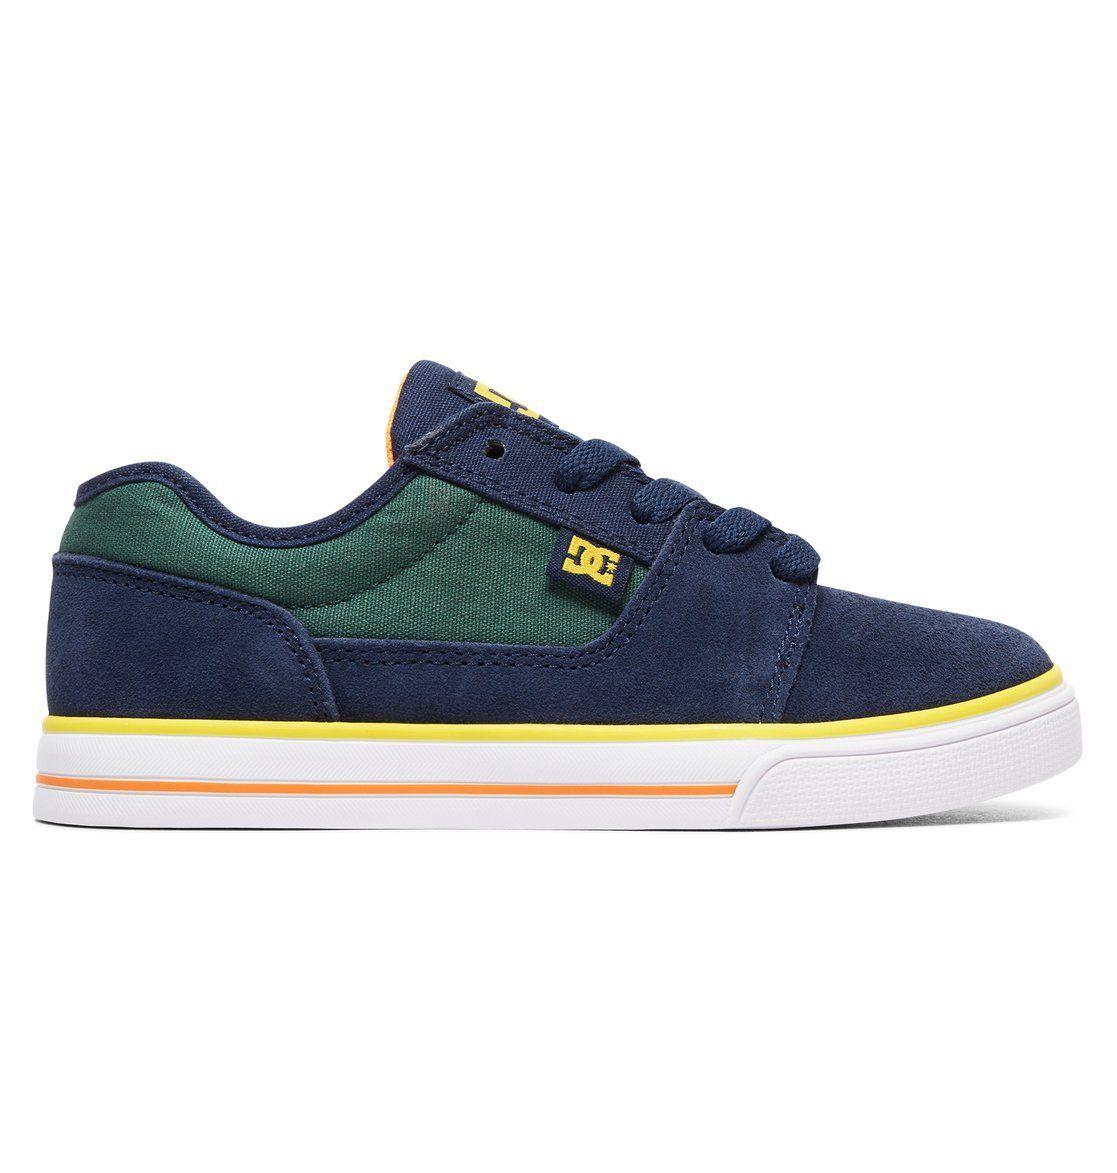 Buy DC Shoes Tonik Multi Kids Shoes at